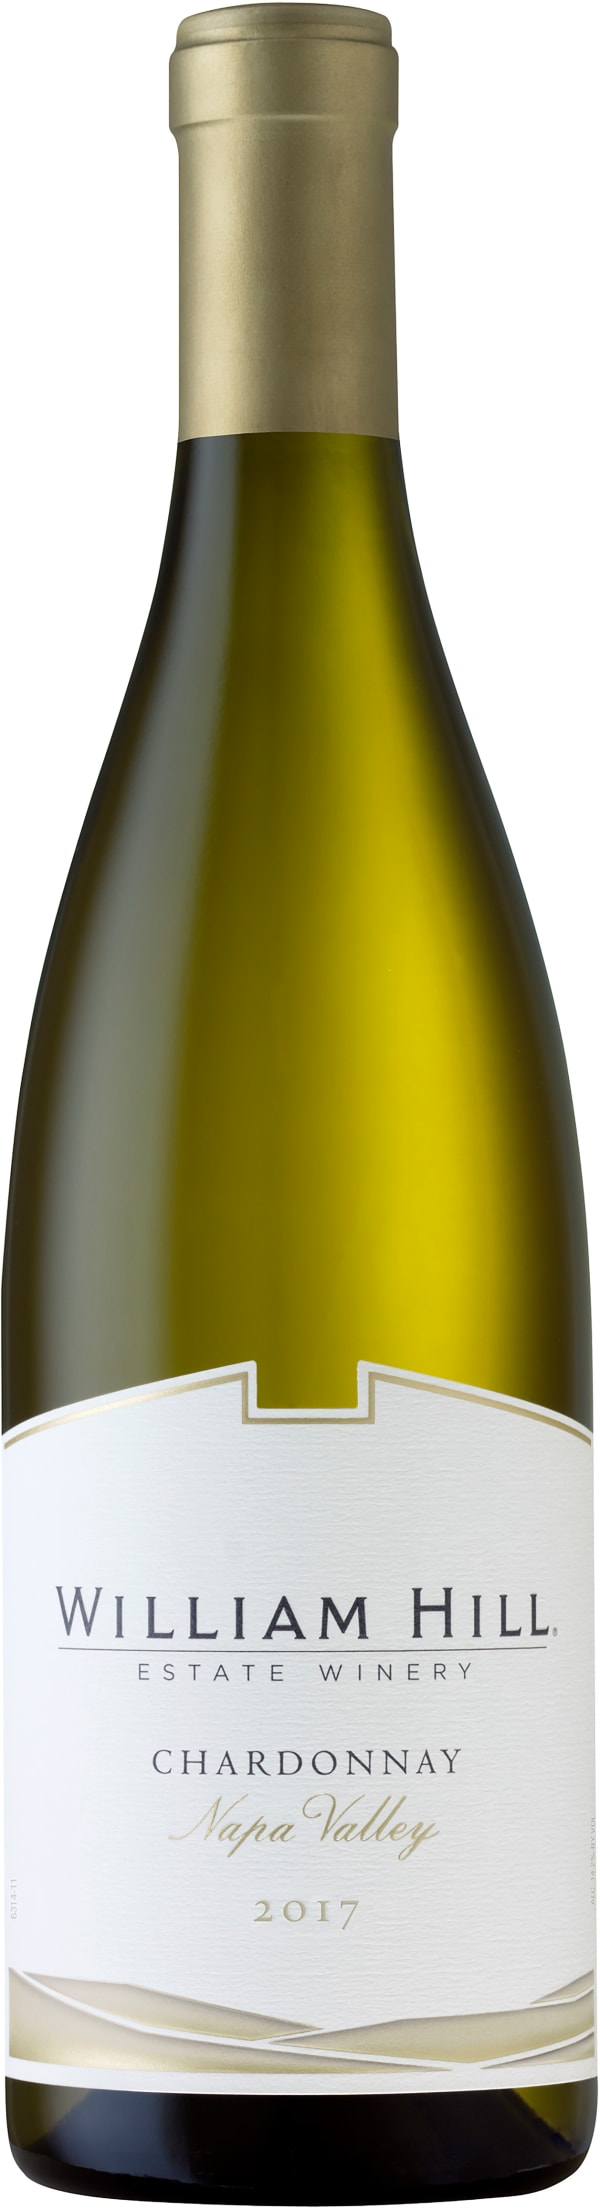 William Hill Napa Valley Chardonnay 2017